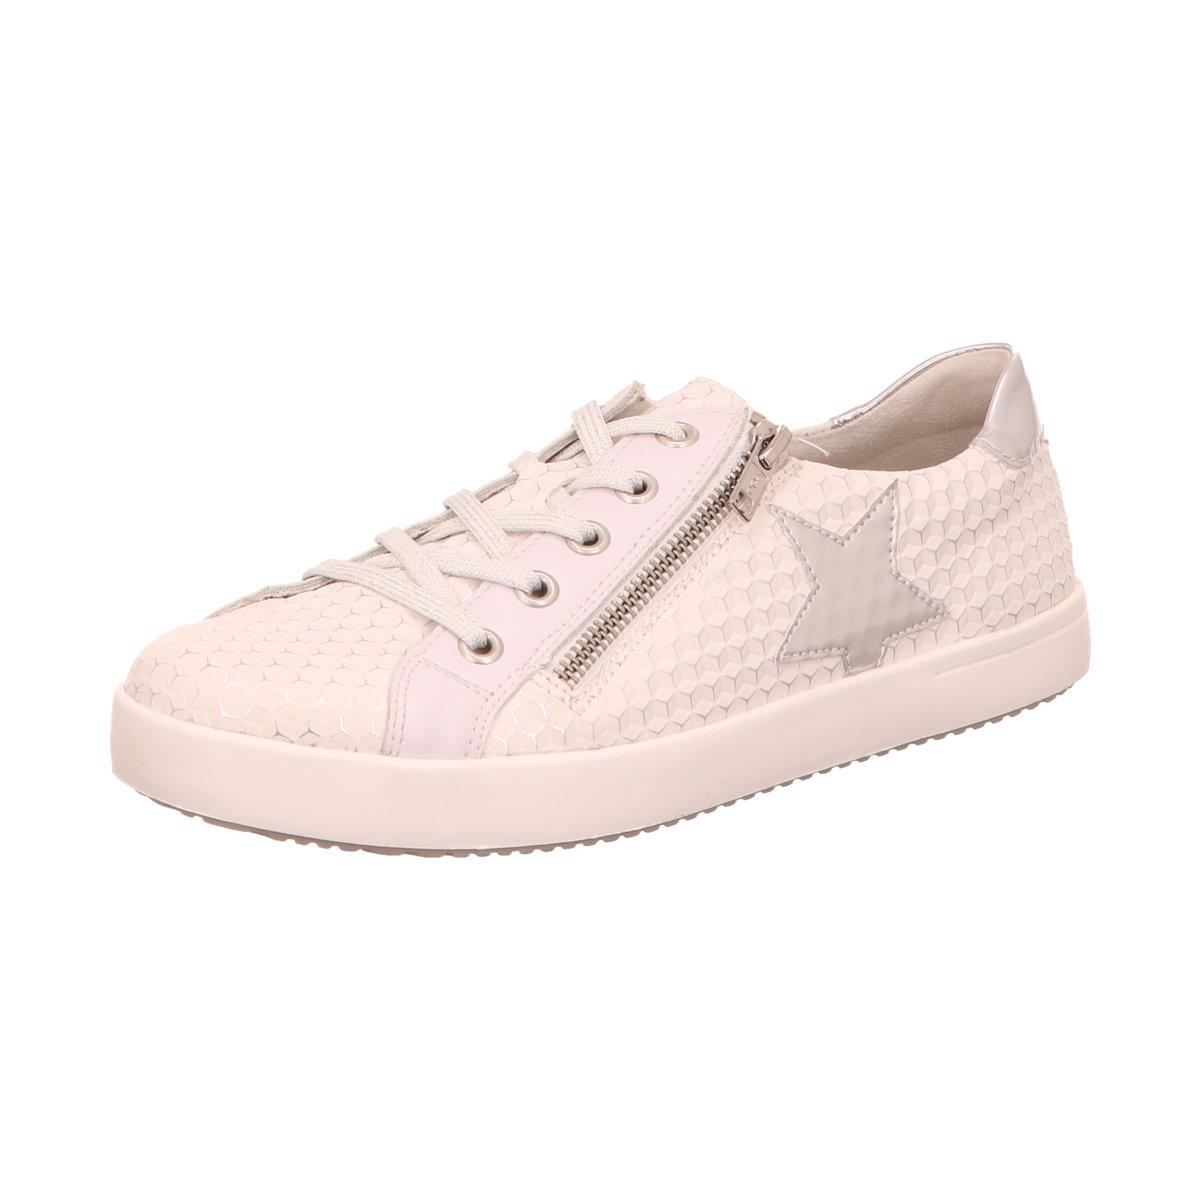 ba2230e774b Nike Kobe XI XI XI 11 TB Promo Purple Basketball Shoes 856485-551 Size 18  Big and Tall 1a9ed7